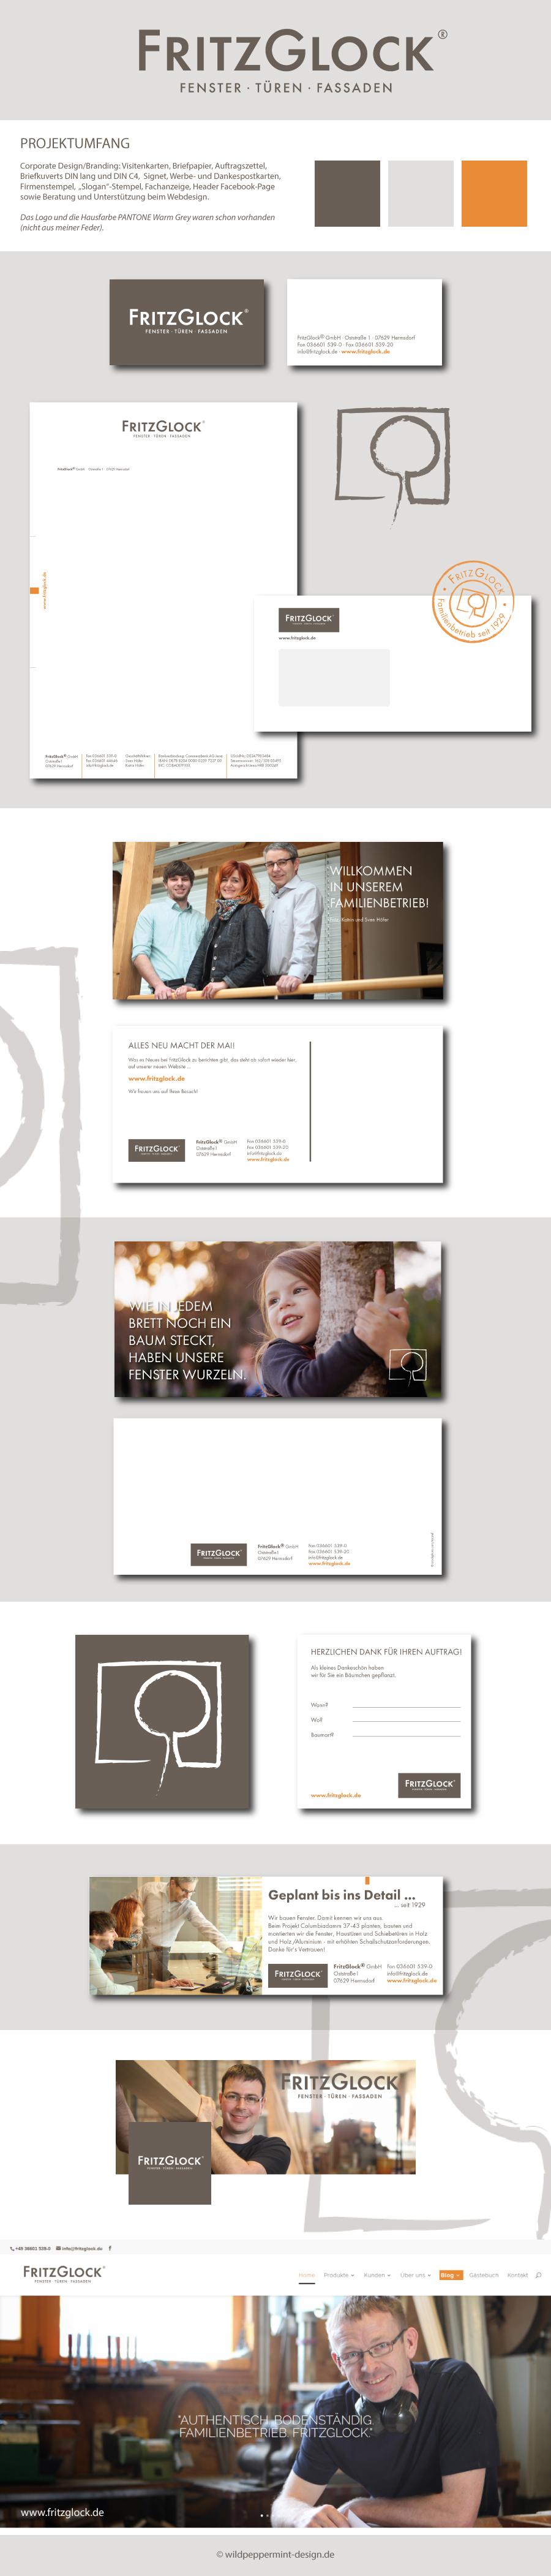 branding  Corporate Design businesscards Geschäftspapiere postkarten Stempel Signet